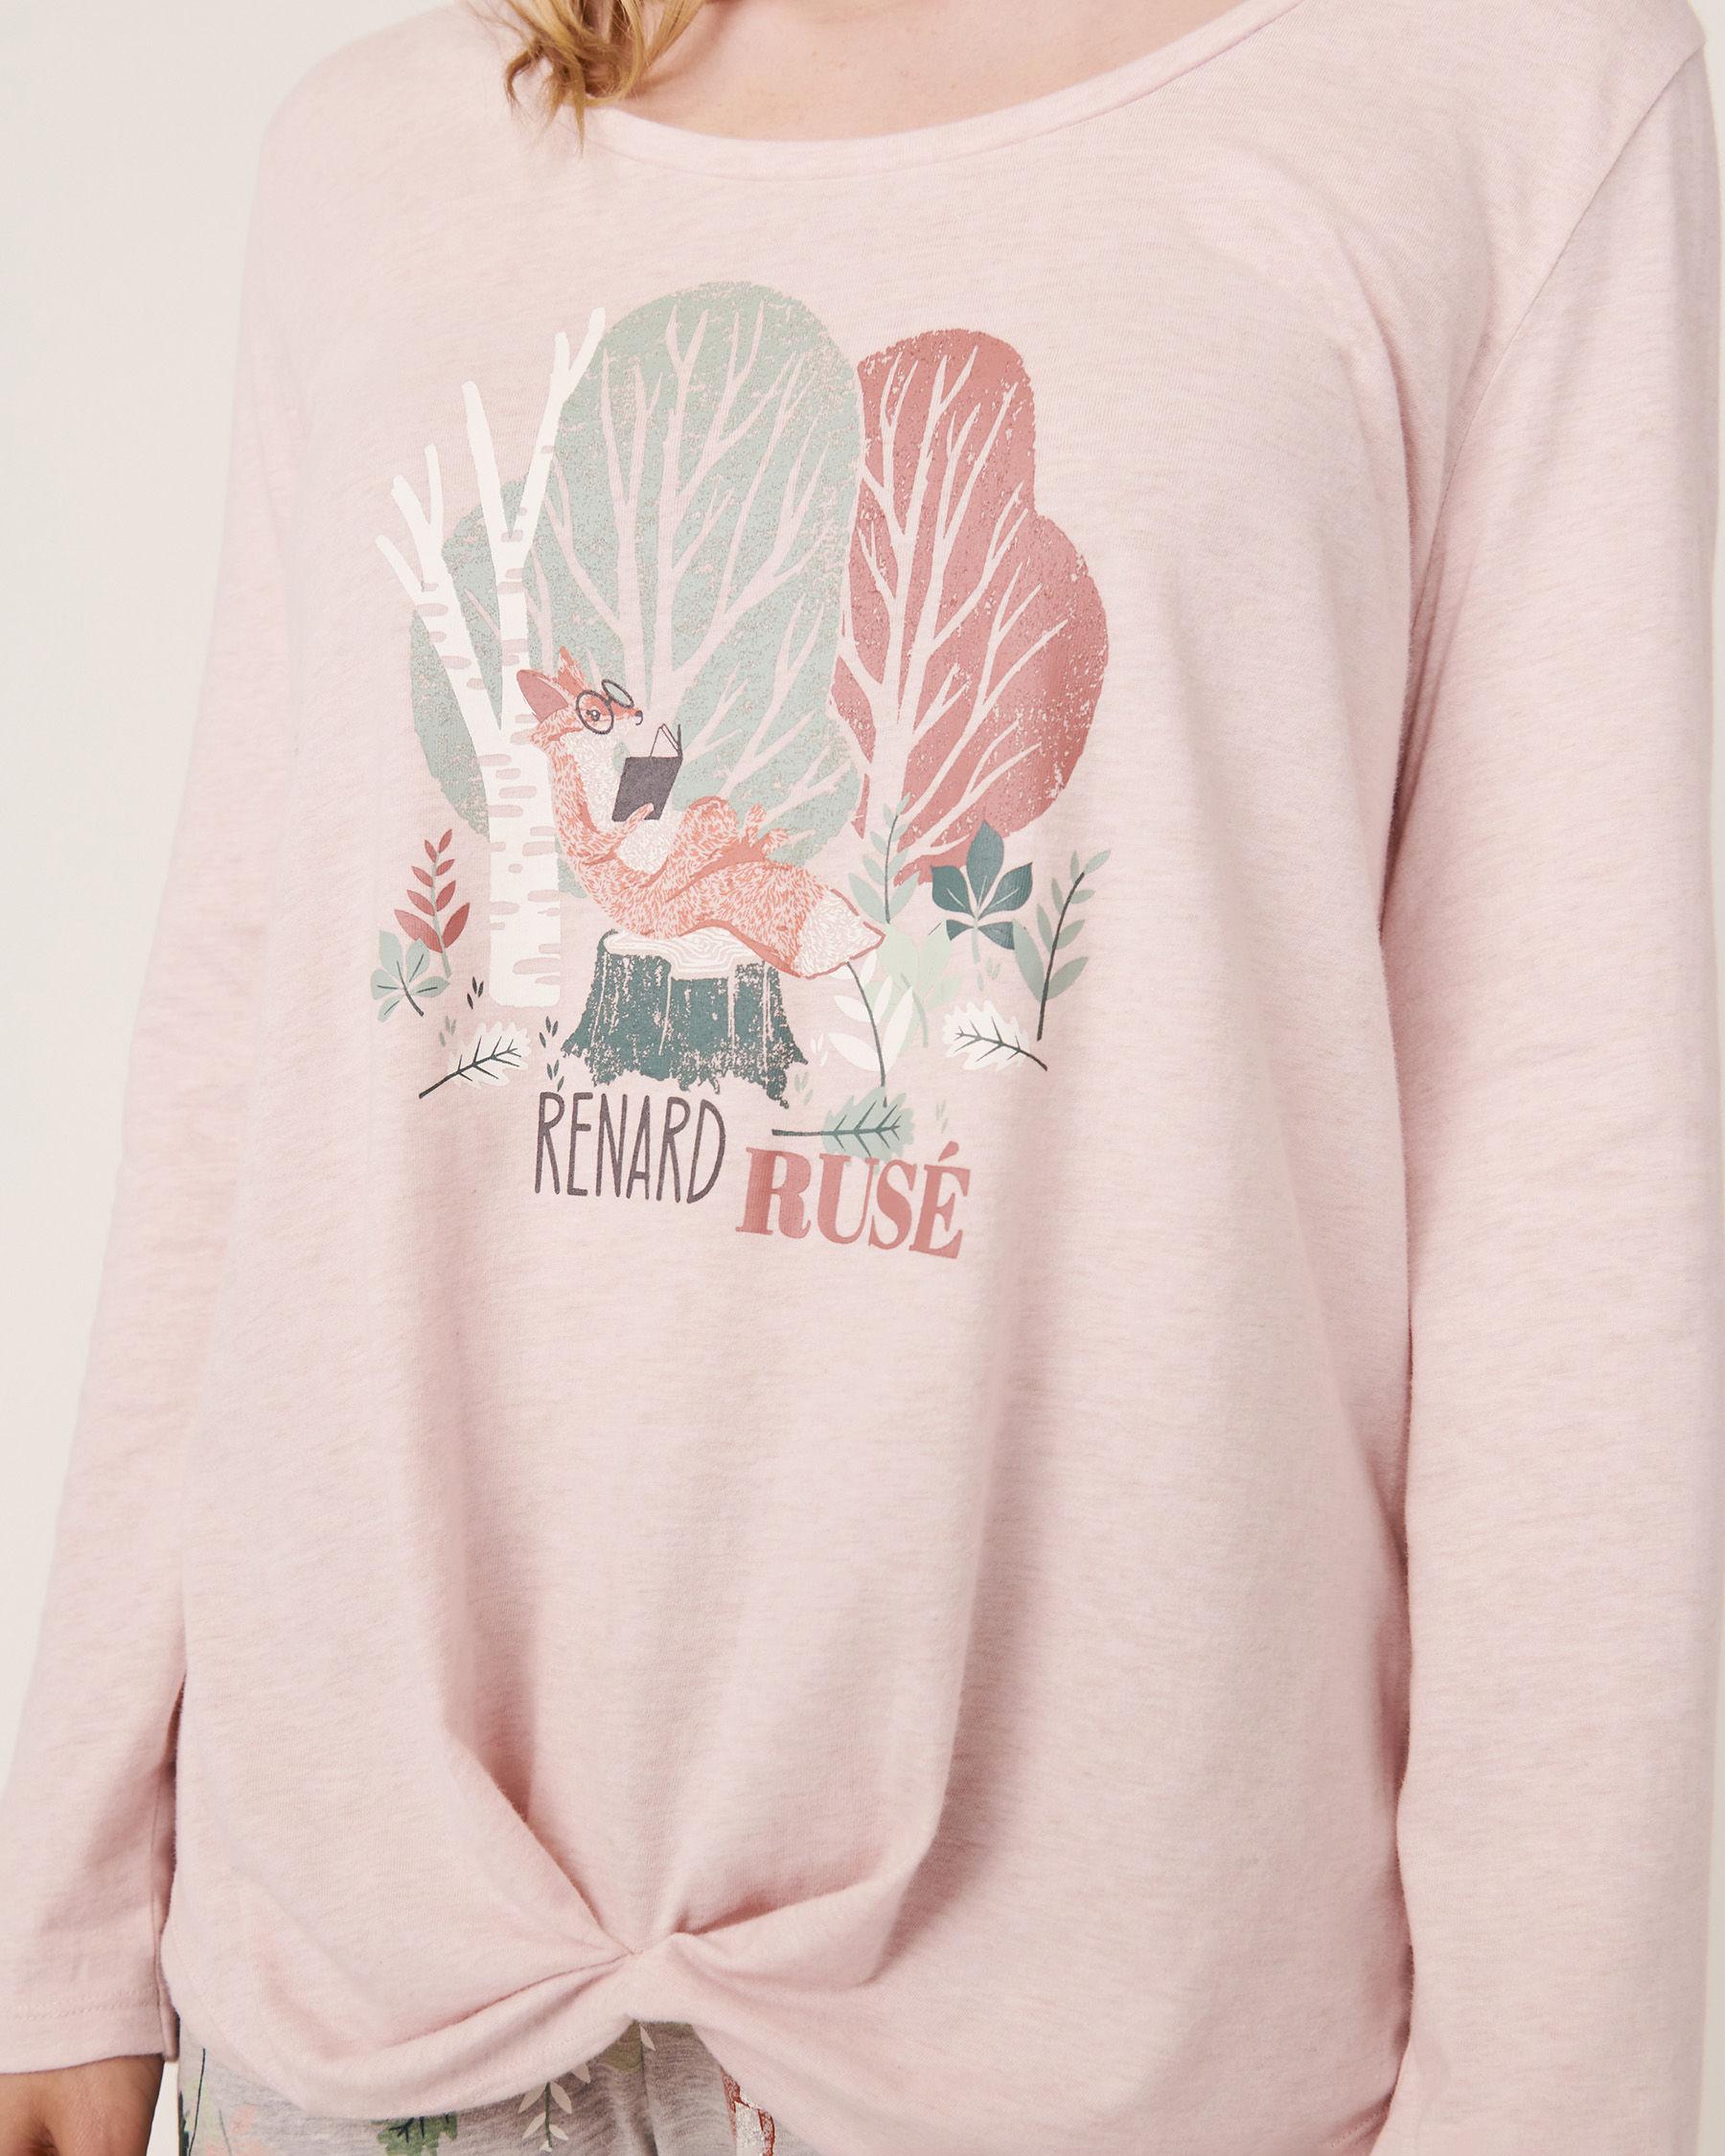 LA VIE EN ROSE Long Sleeve Twisted Shirt Pink mix 40100098 - View3